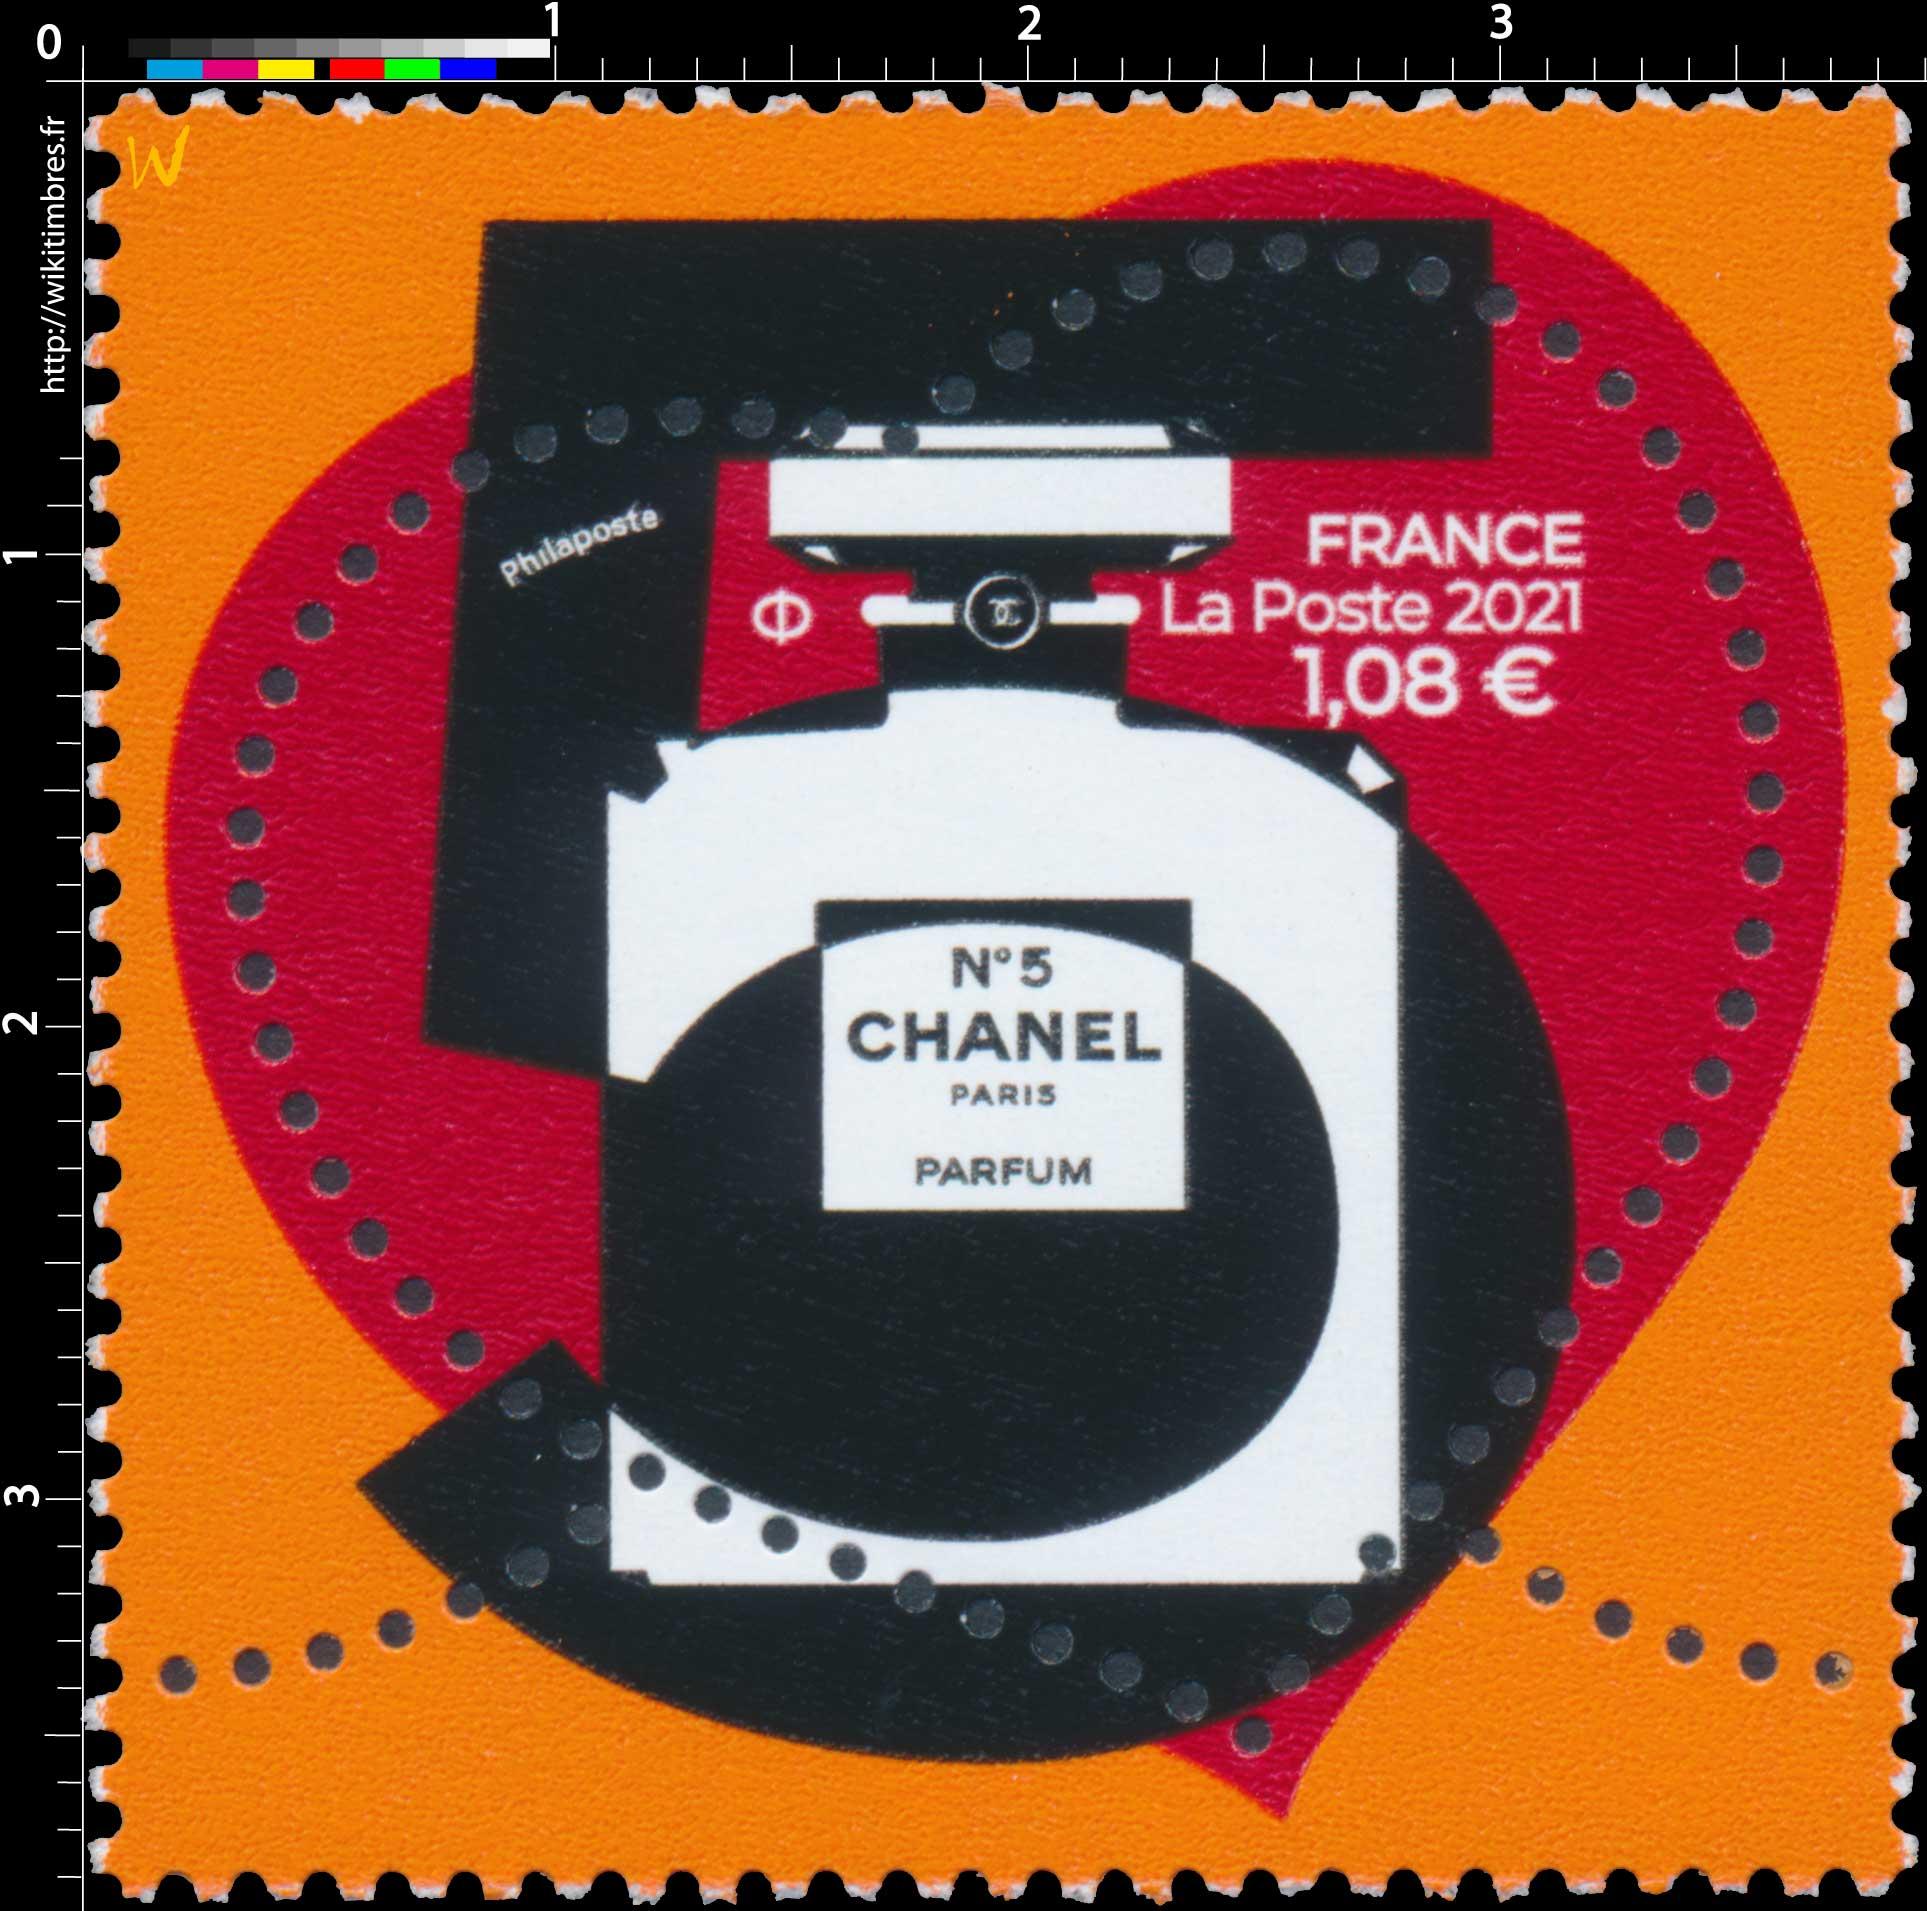 2021 N°5 CHANEL PARIS PARFUM